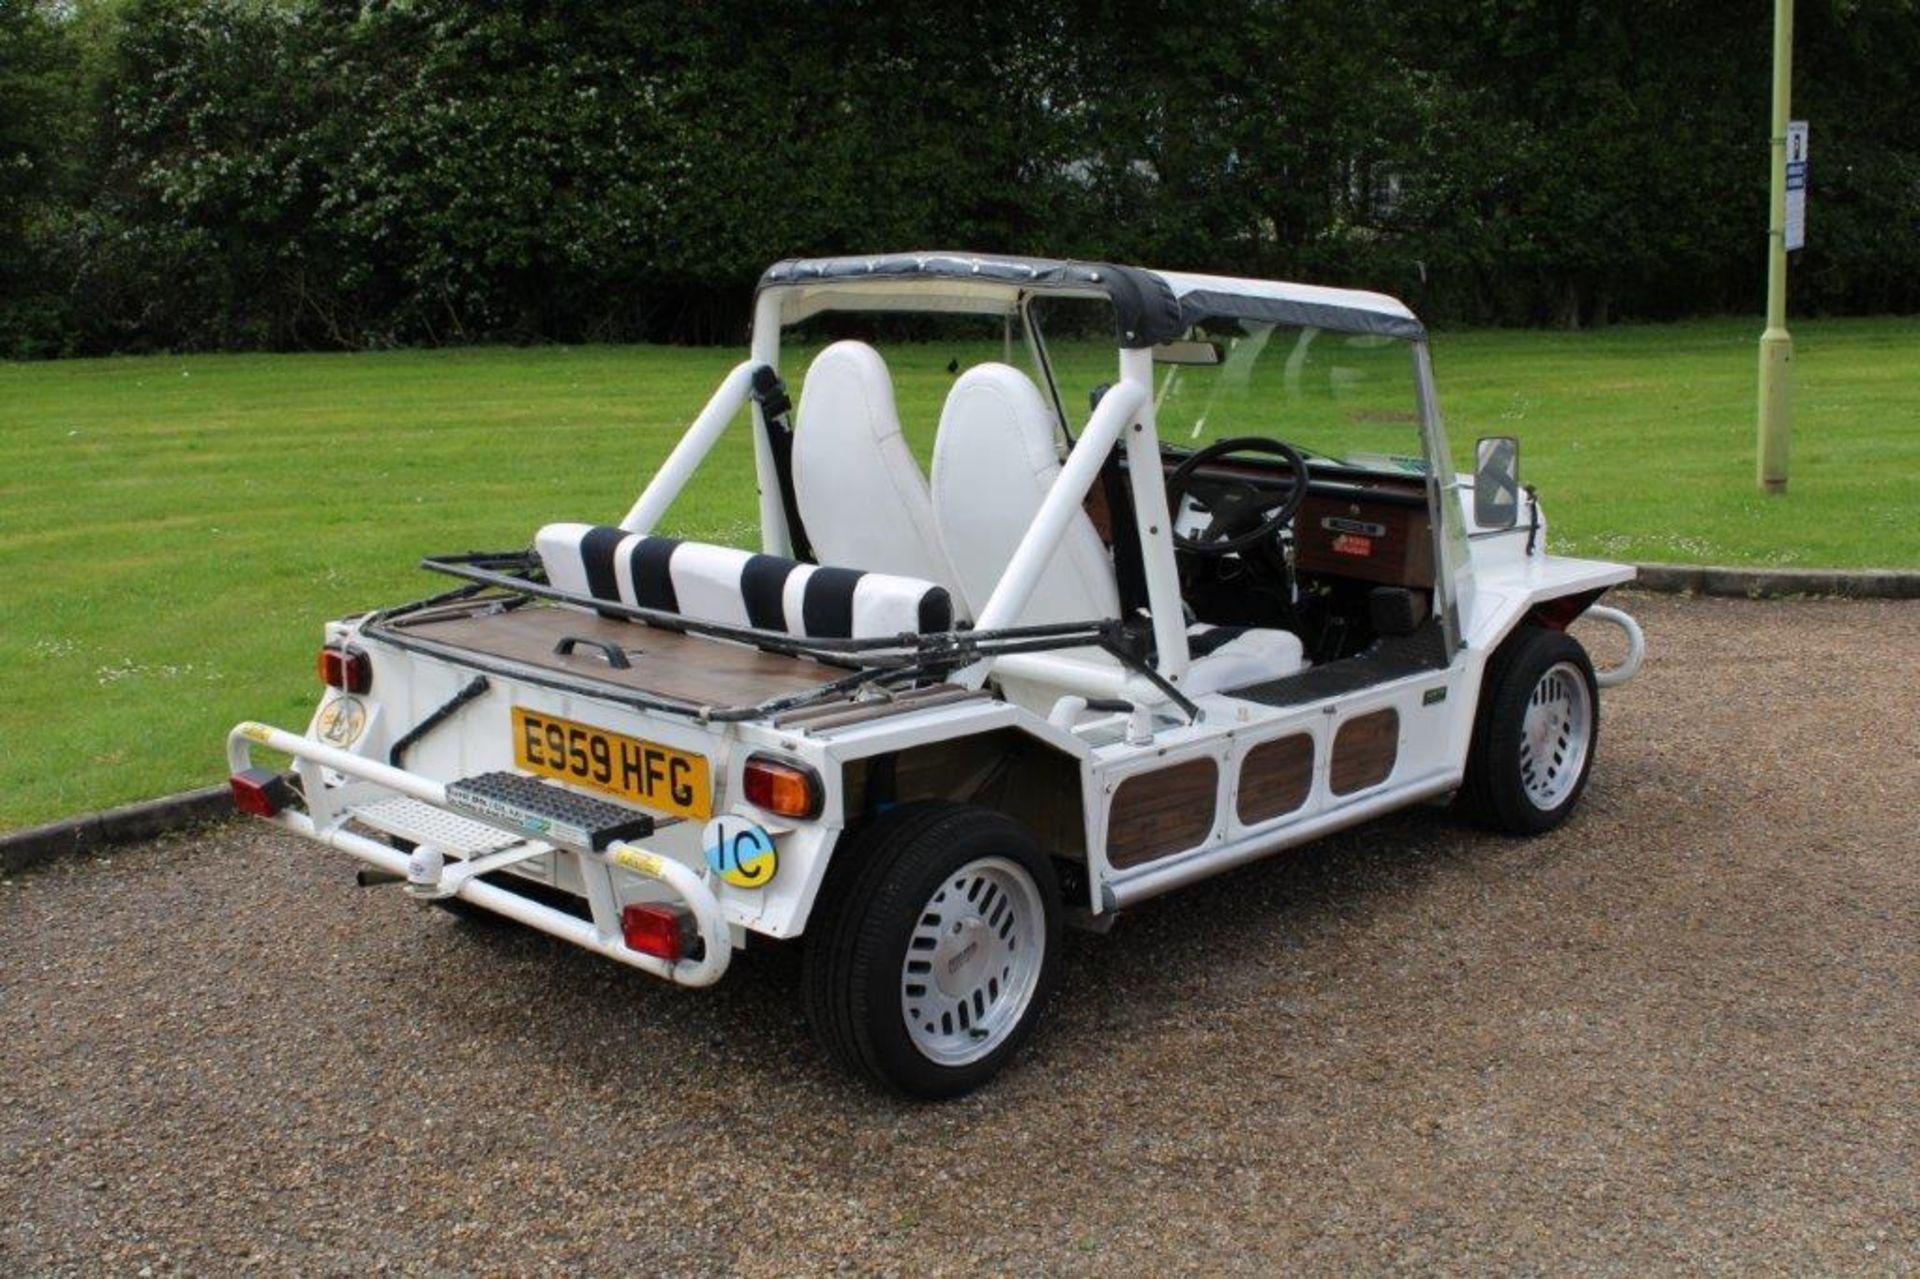 1988 Austin Rover Mini Moke - Image 2 of 22